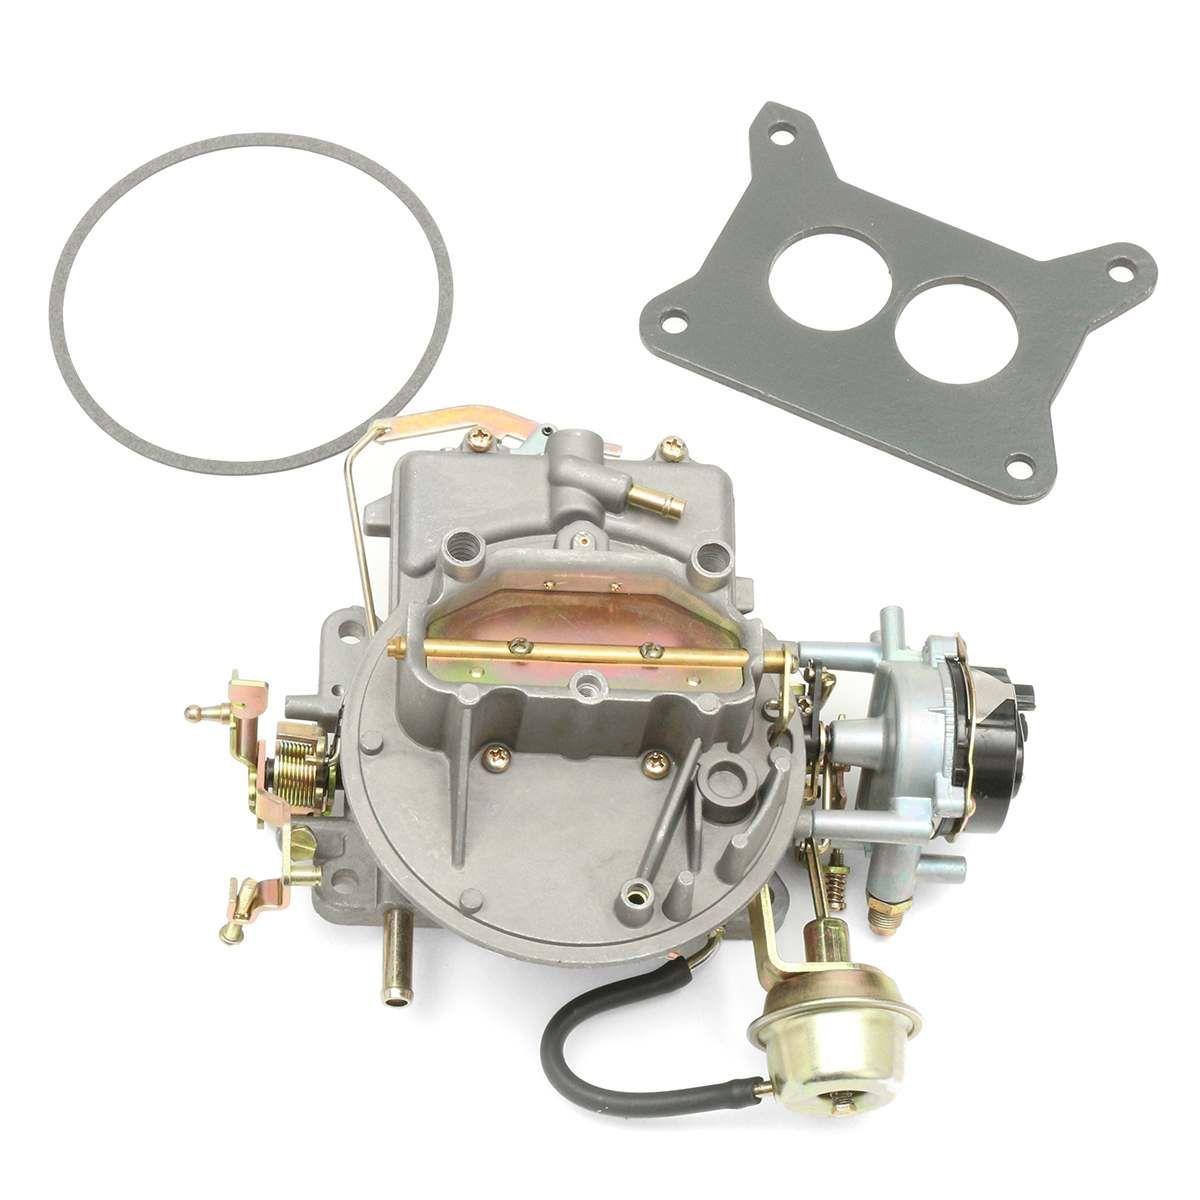 2 Barrel Carburetor Carb 2100 For Ford F100 F250 F350 for Mustang Engine 289 302 351 1964~1984 Engine